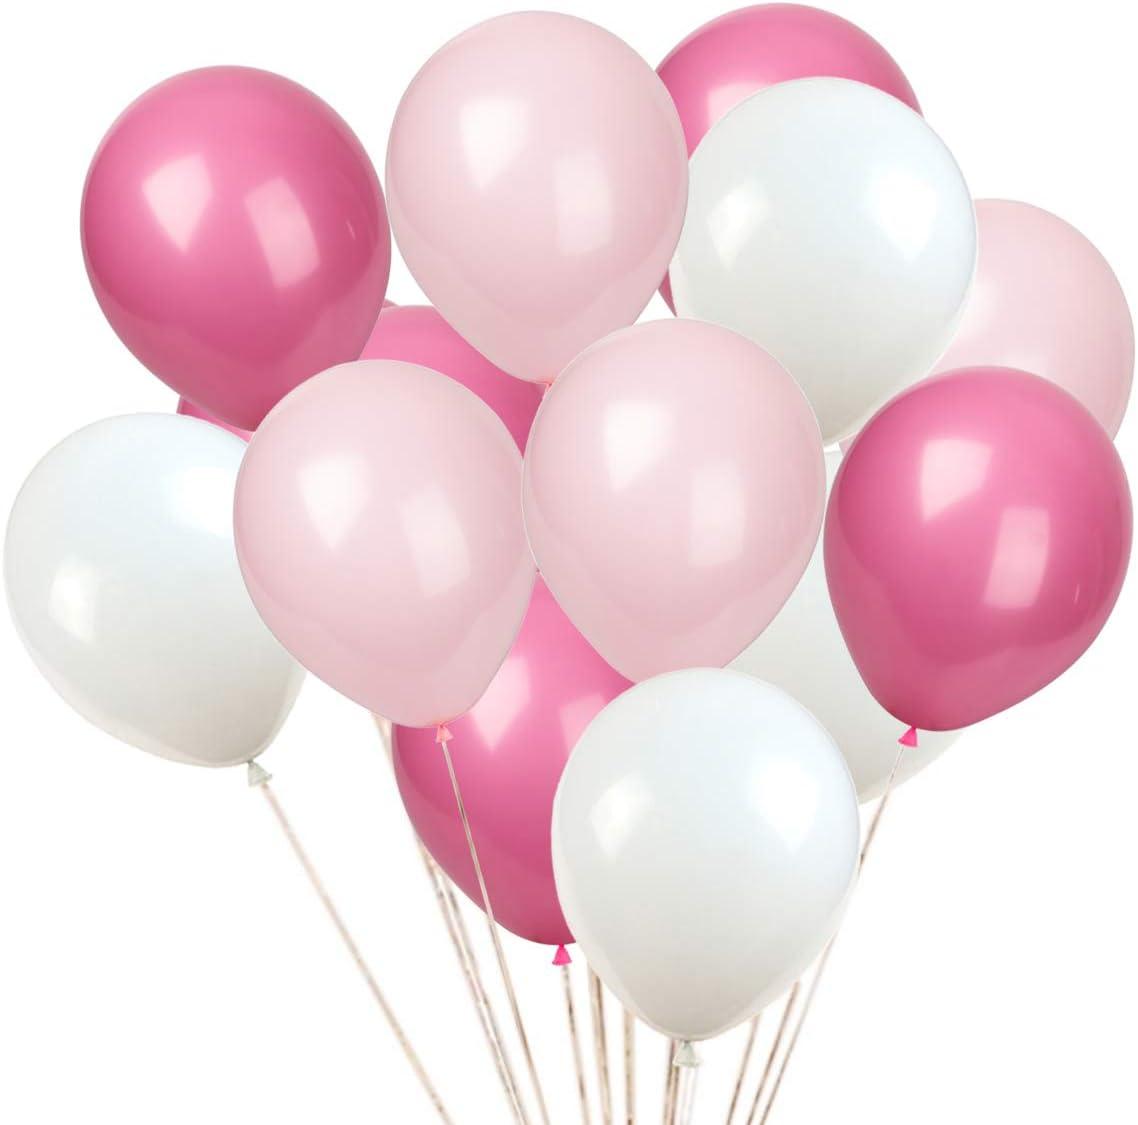 Amazon.com: KADBANER Latex Balloon 100 pcs 12 inch : White and ...